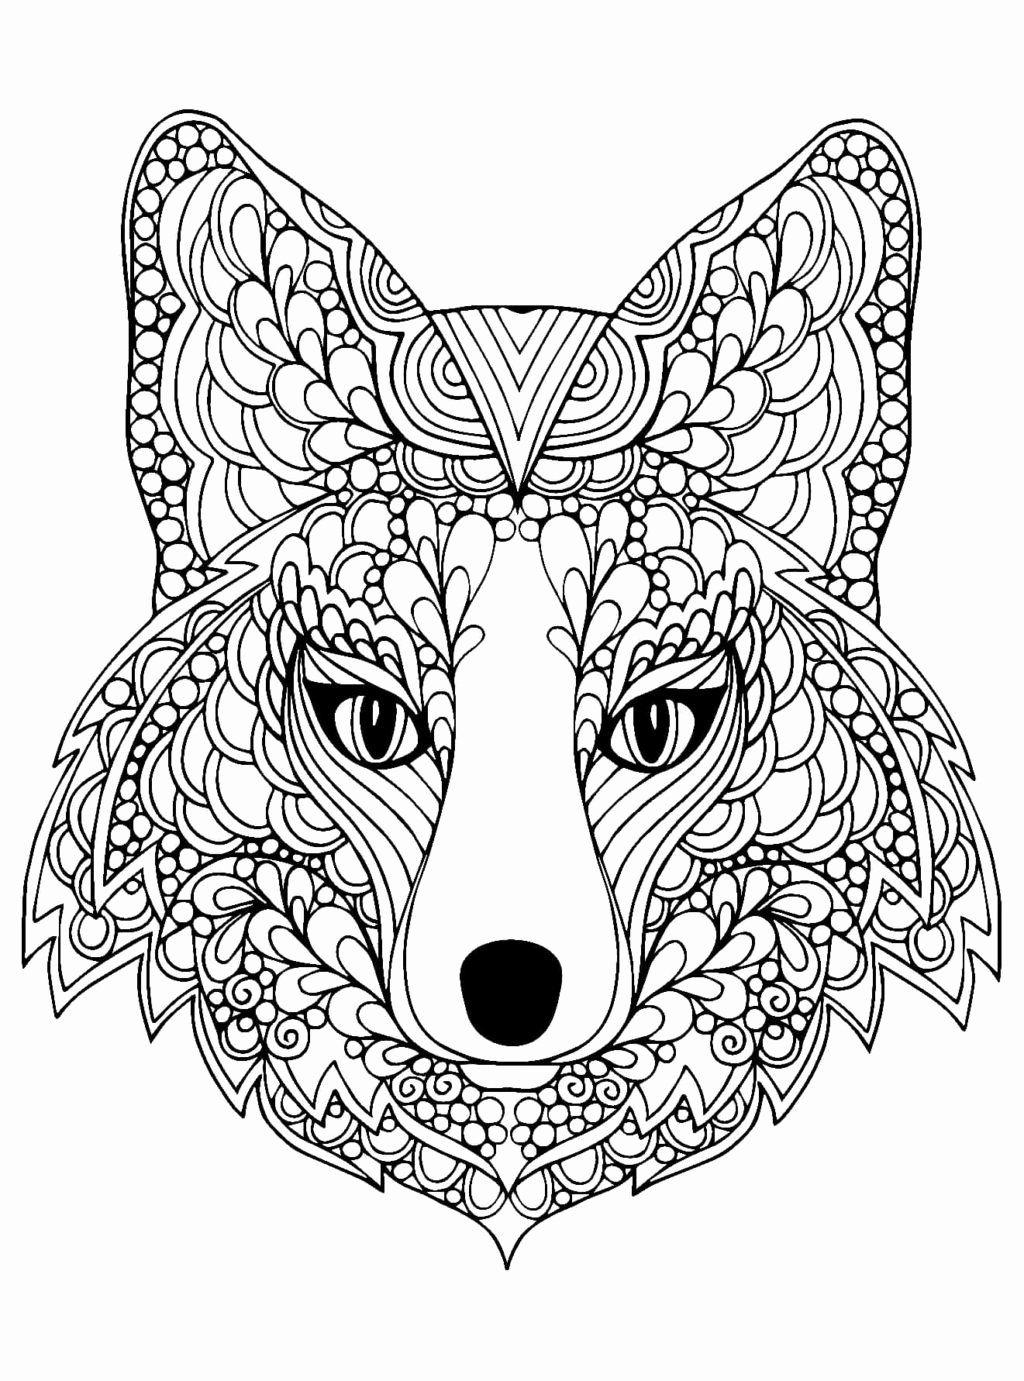 Pin By Marleen Verlinden On Colorir 11 Fox Coloring Page Animal Coloring Pages Mandala Coloring Pages